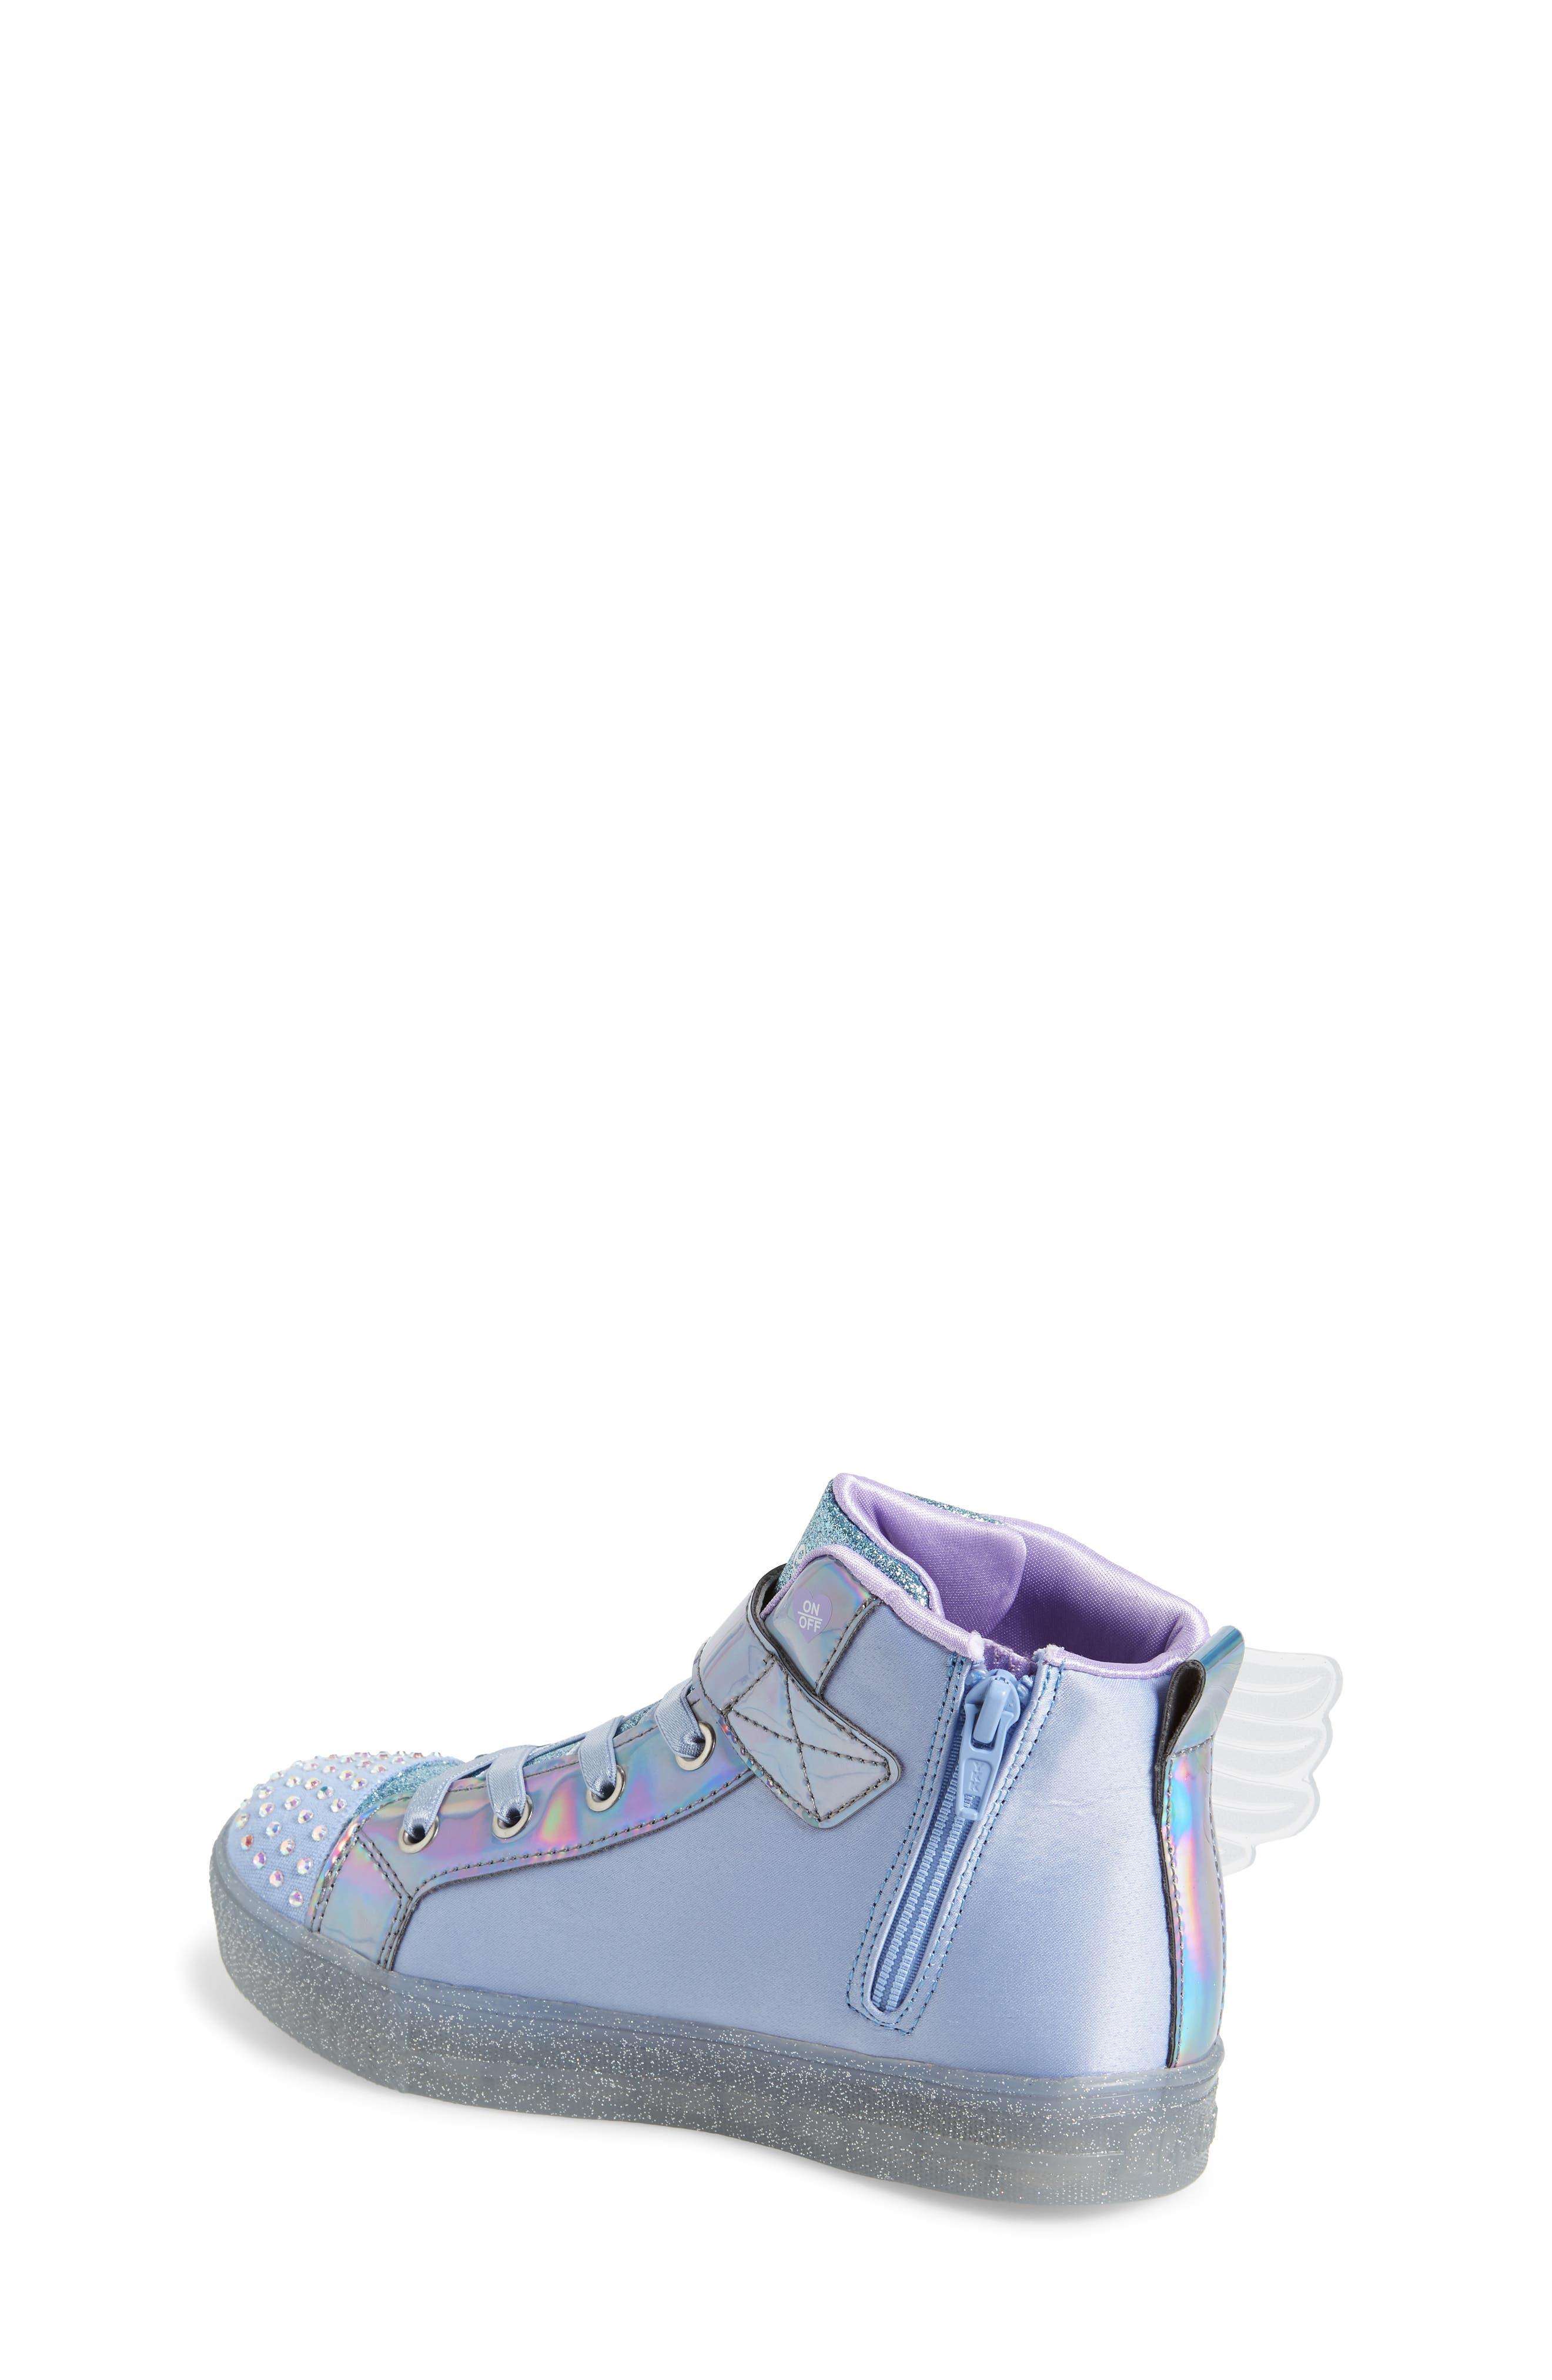 SKECHERS, Twinkle Toes Light-Up Sneaker, Alternate thumbnail 2, color, PERIWINKLE